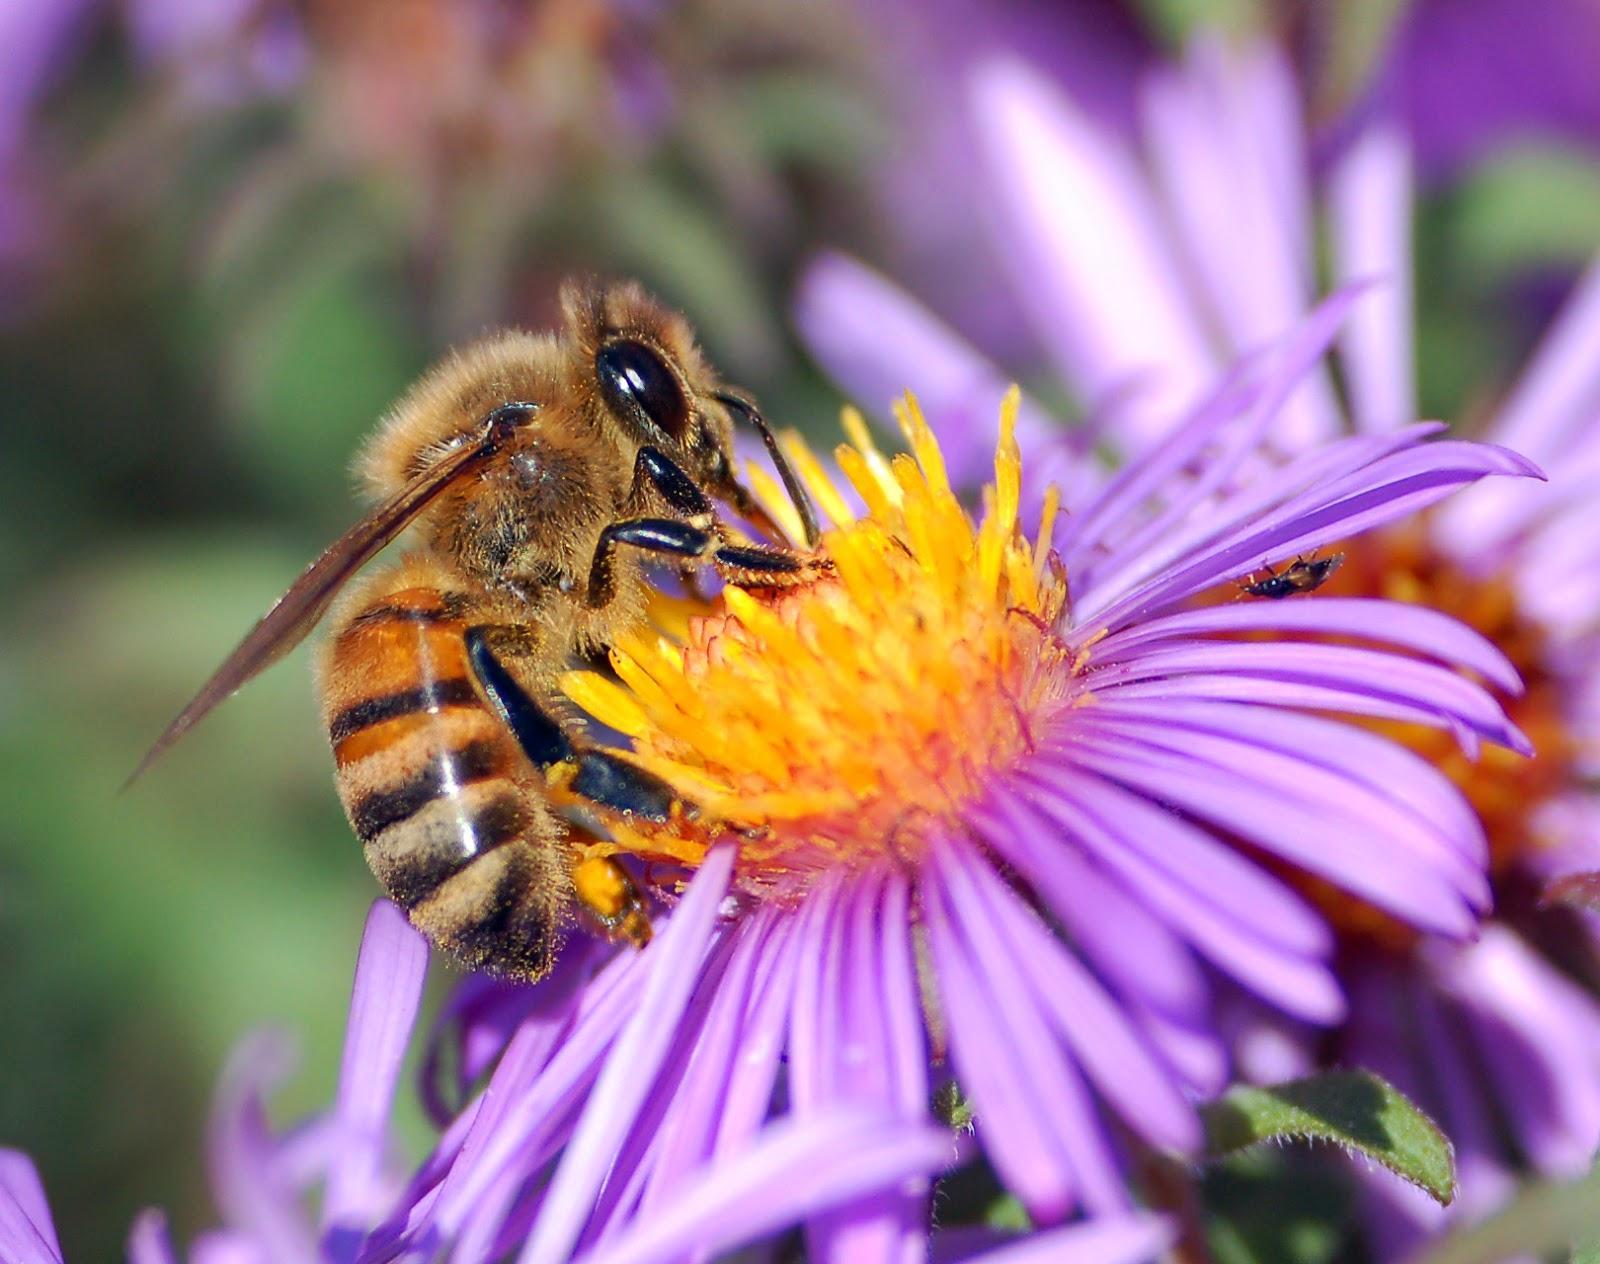 Agen pendebungaan serangga